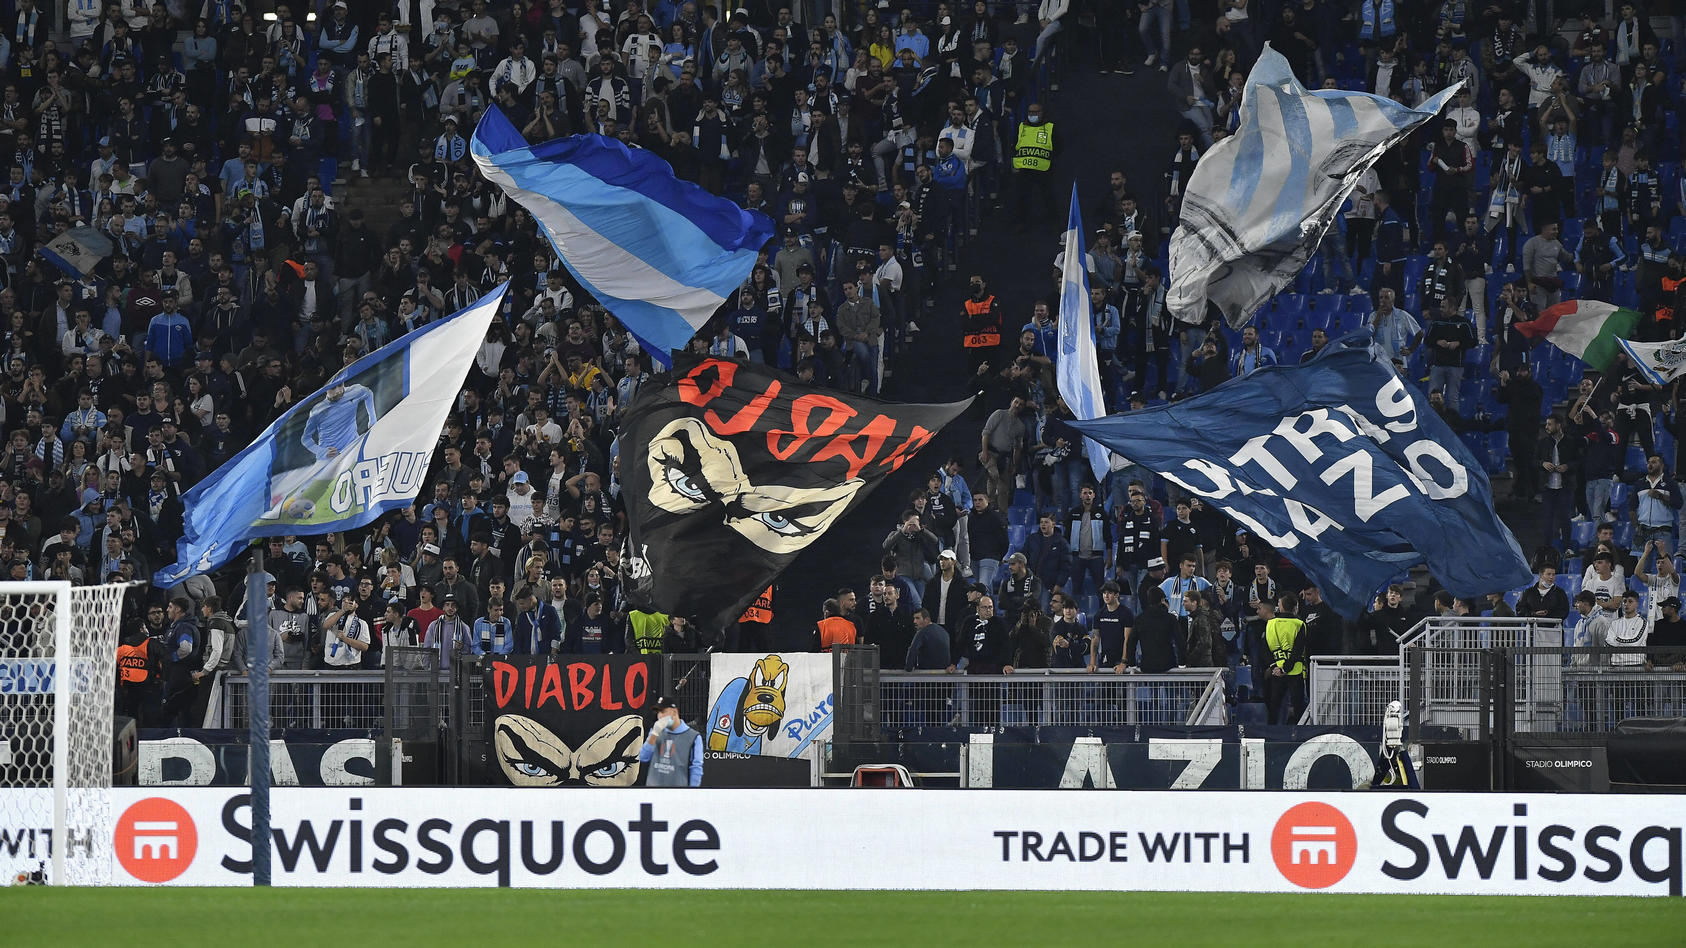 bei-spiel-gegen-marseille-rom-fans-sorgen-fur-rassismus-skandal